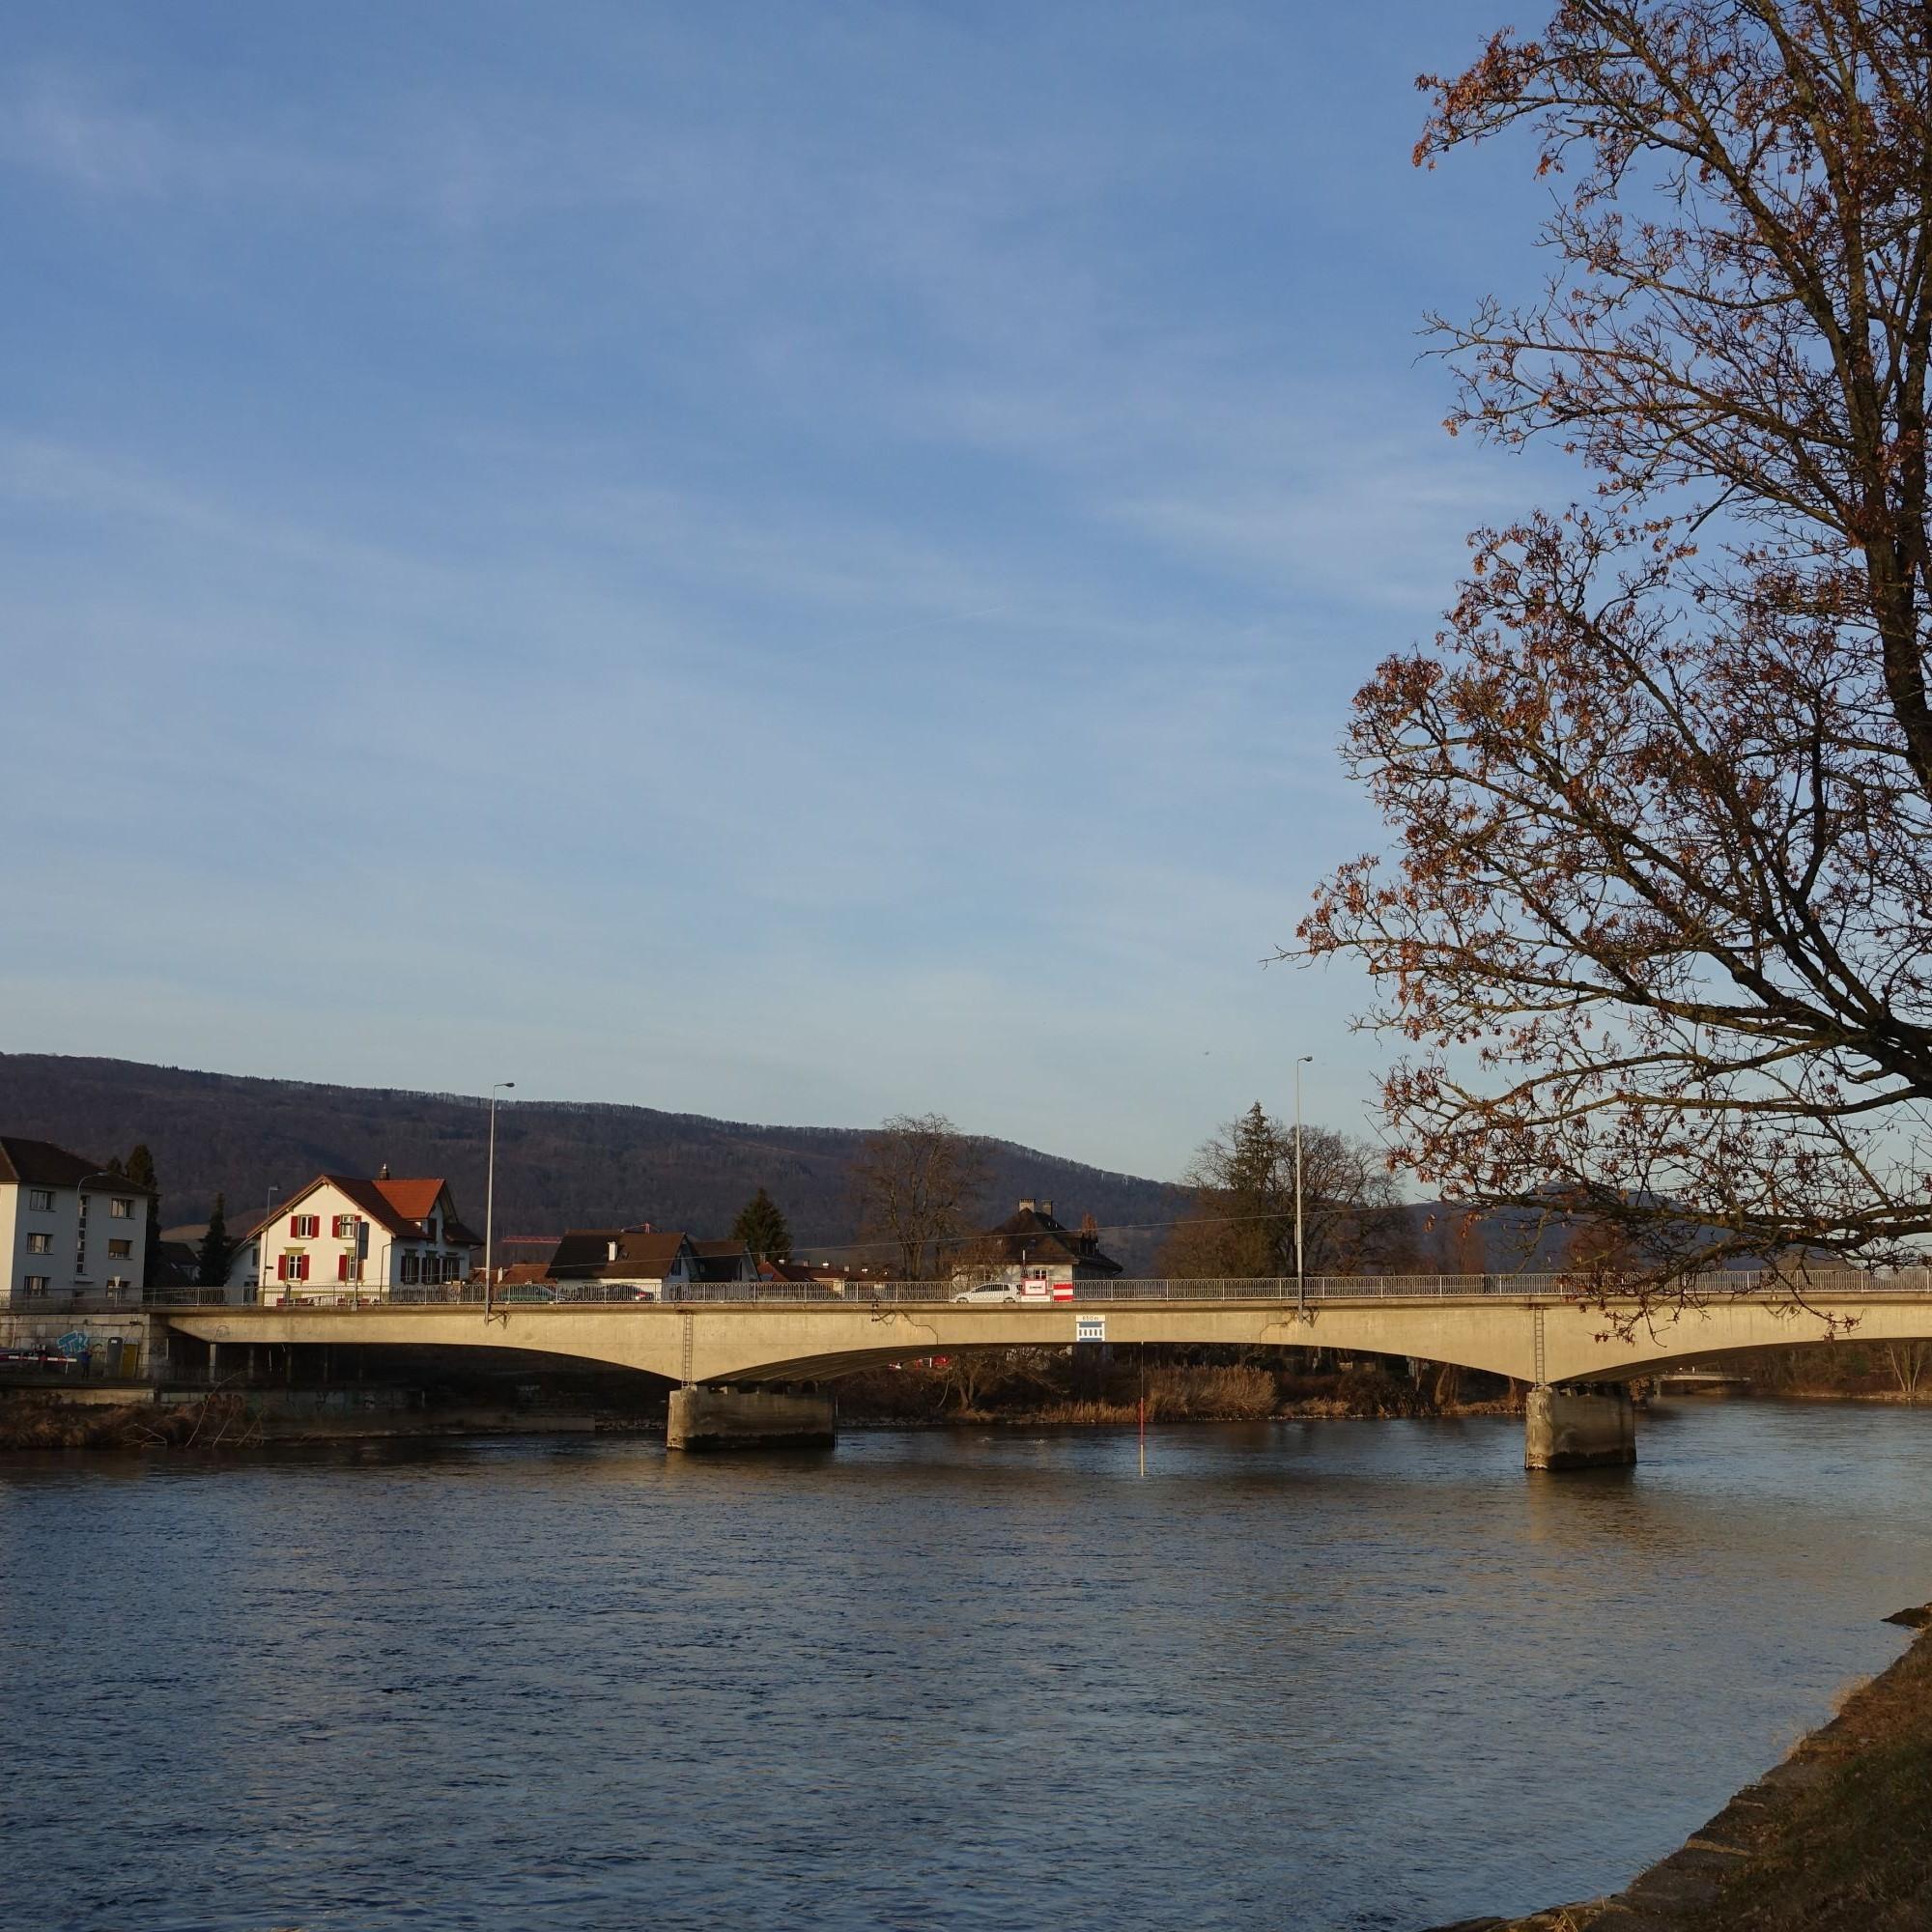 Die Kettenbrücke in Aarau wurde in diesem Jahr abgerissen.